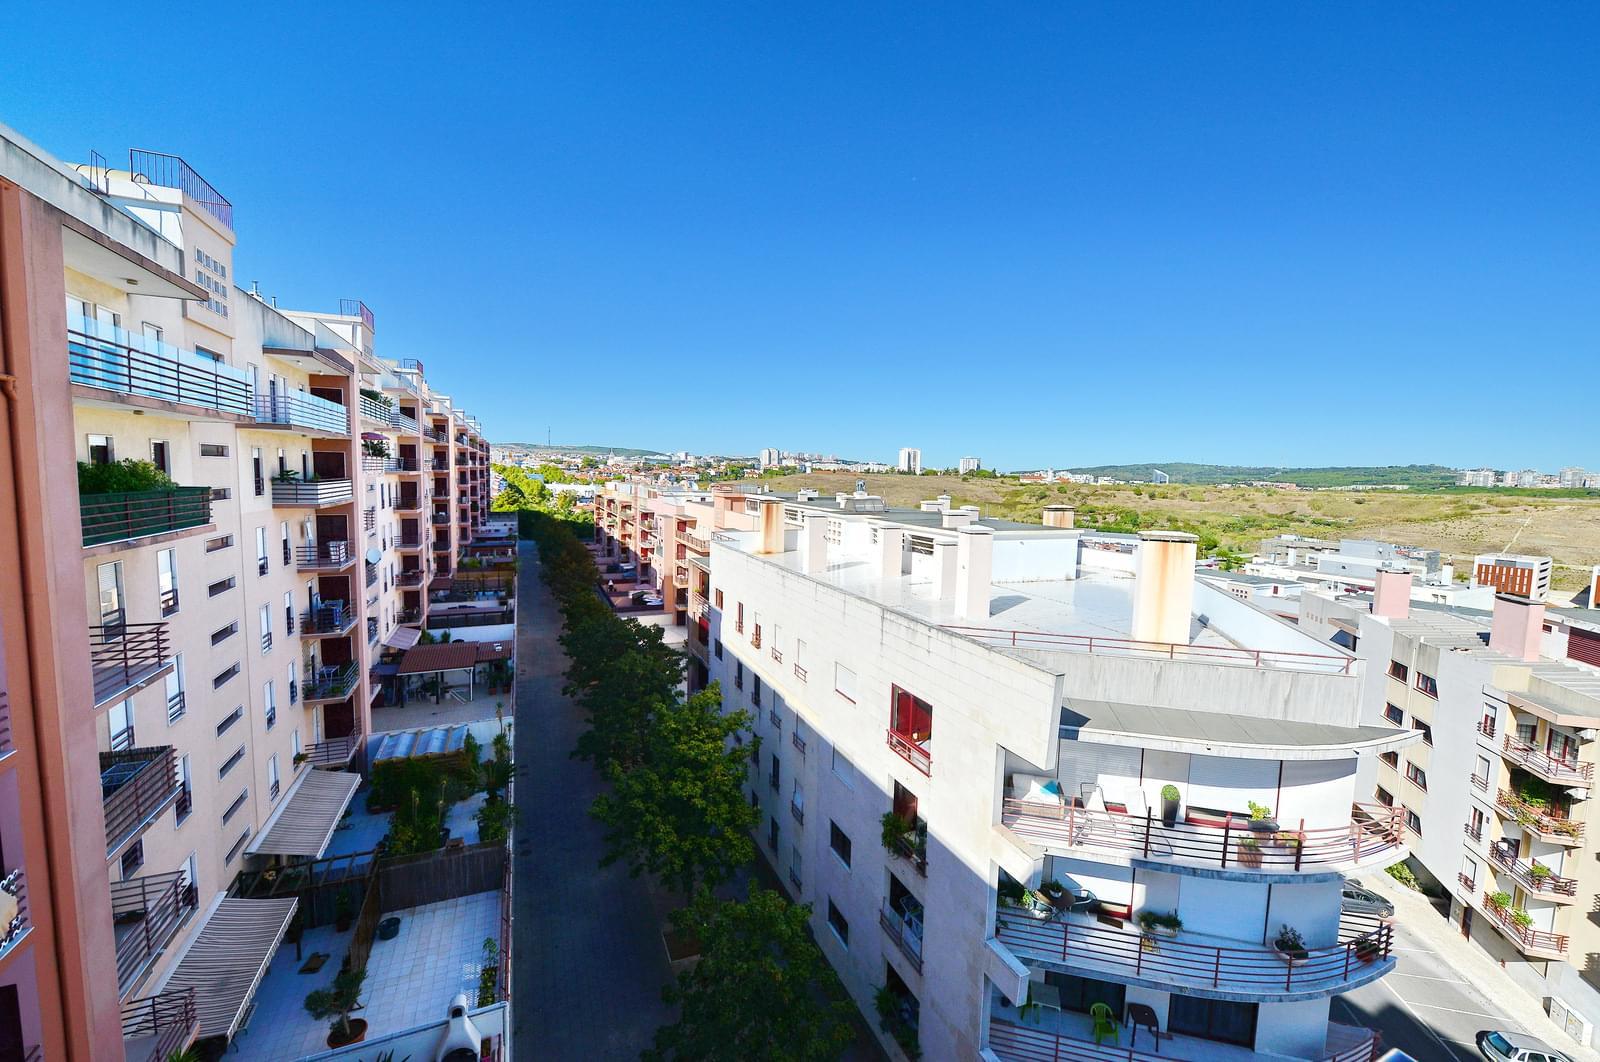 pf17174-apartamento-t3-oeiras-bd73ef3b-4981-4665-83f1-4bbd5d55158d